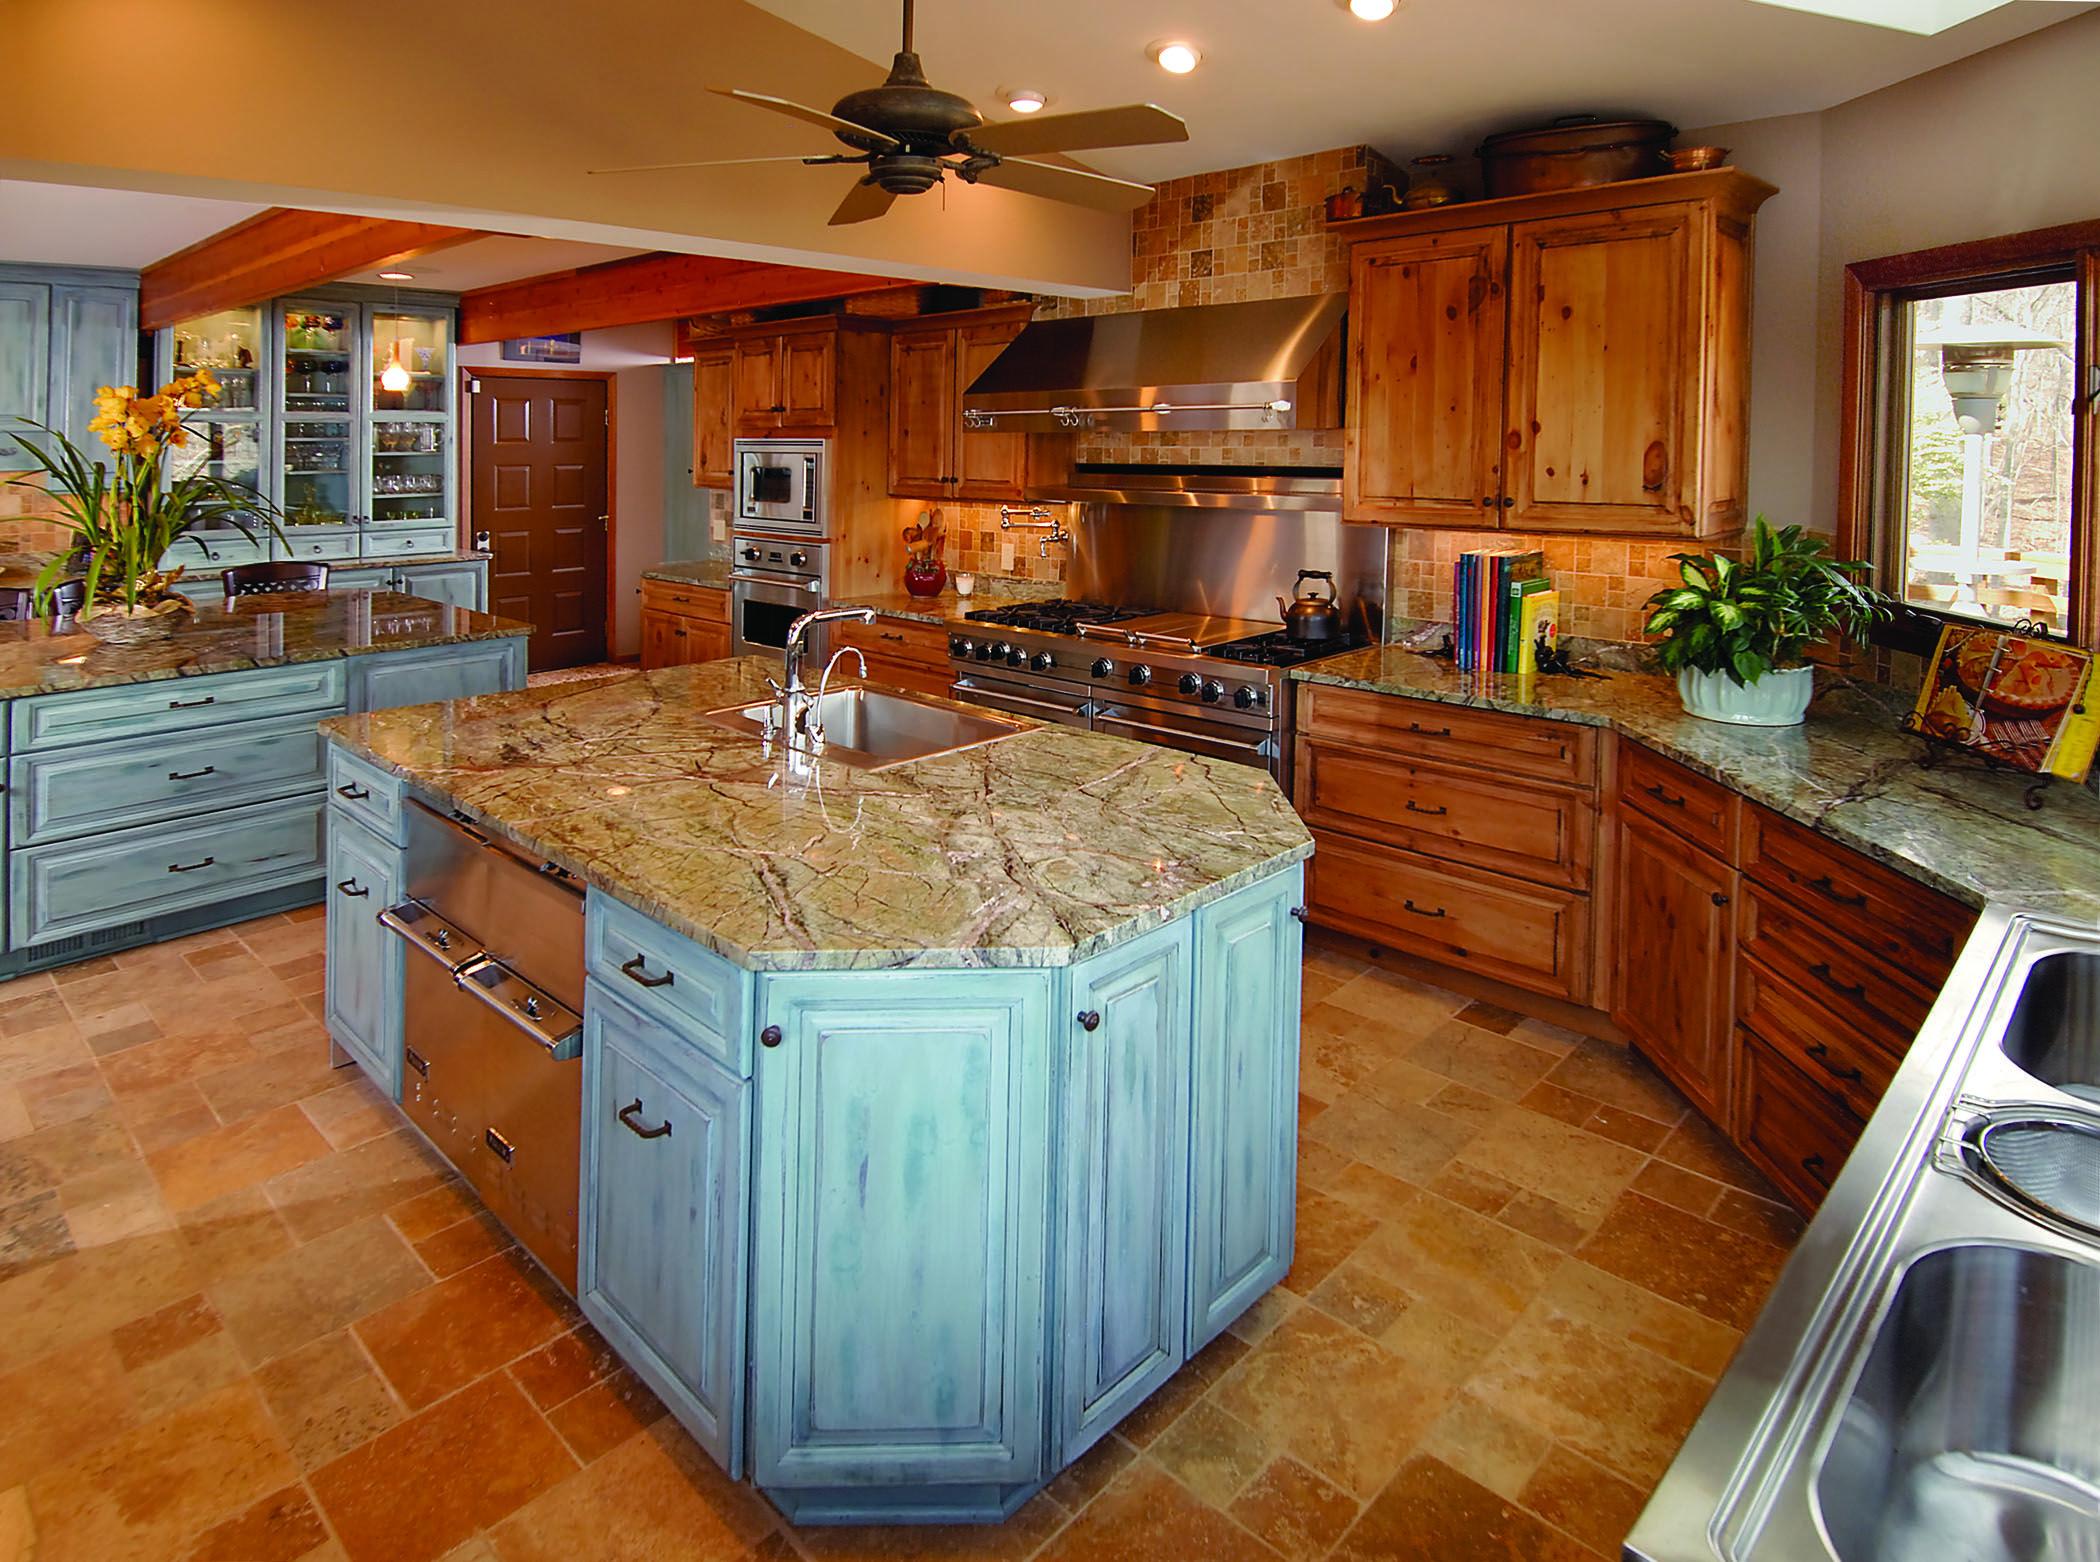 Pittsburgh Kitchen Design and Improvements | Nelson Kitchen & Bath ...